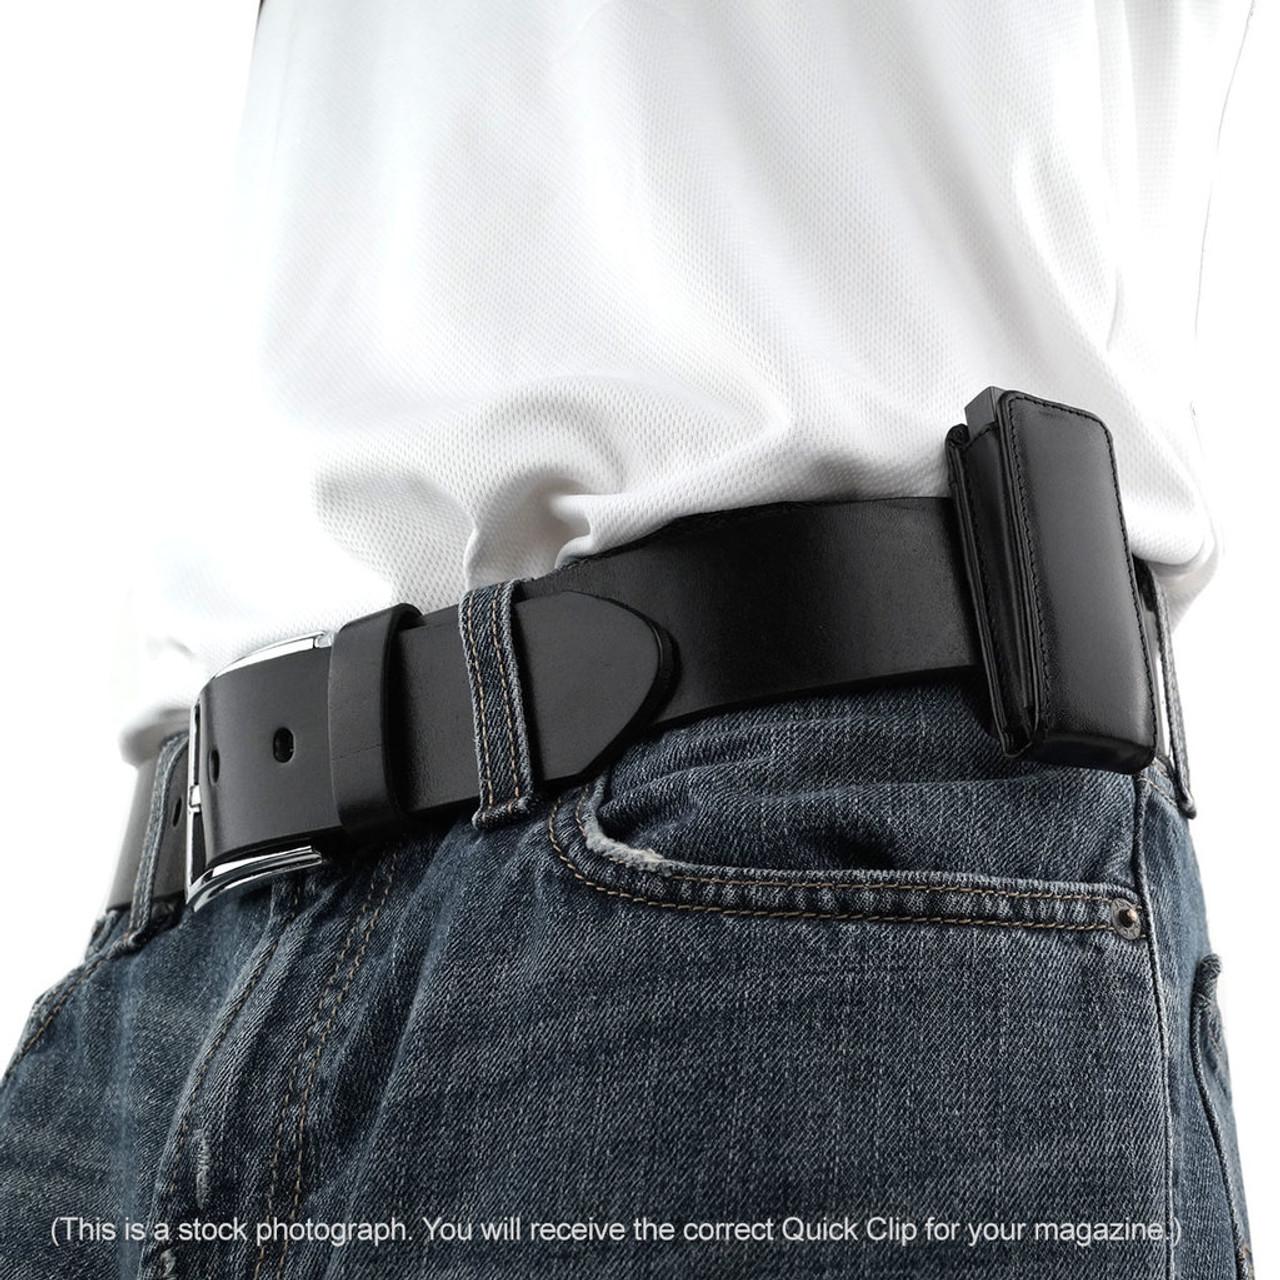 Glock 43X Quick Clip Magazine Holster